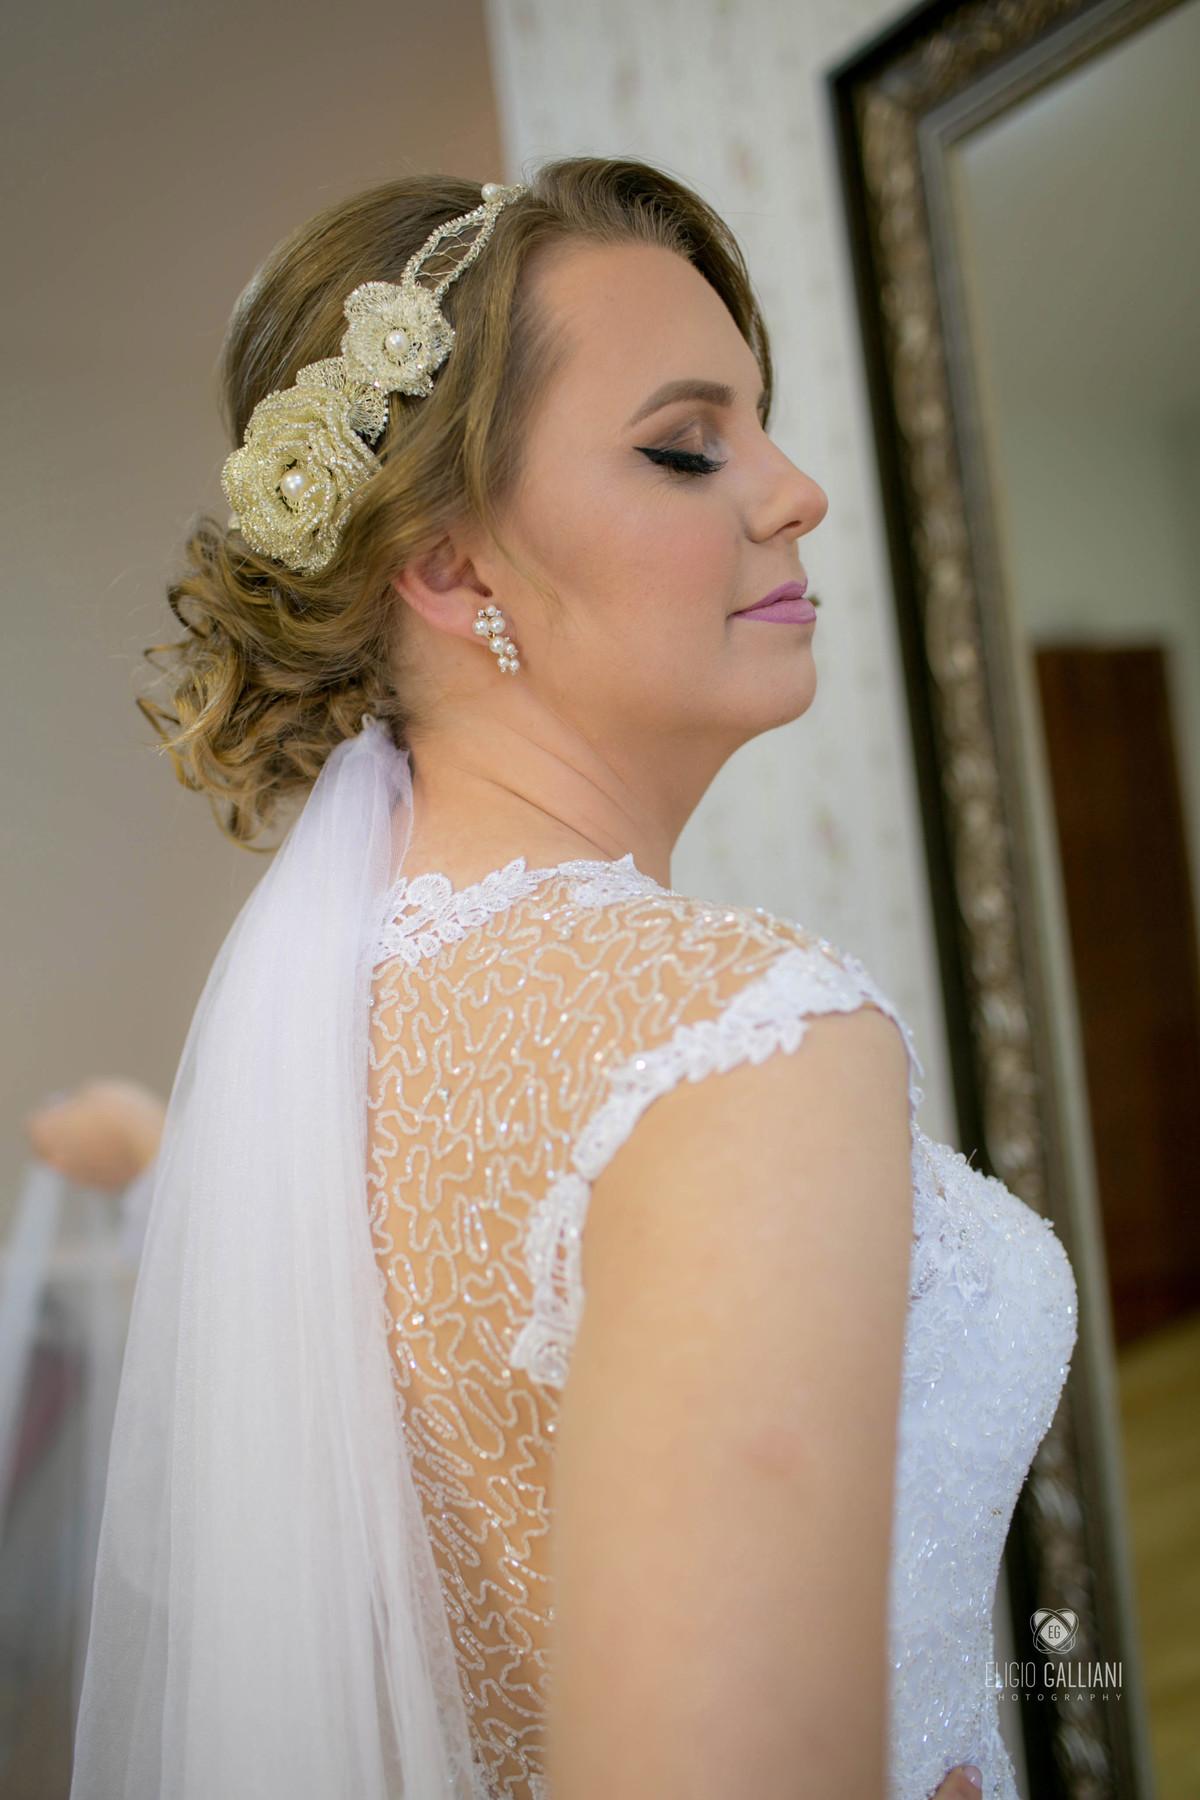 fotografiadecasamento-casamento-eventos-blumenaude-casamento-bride-corupa-familia-fotografo-jaragua-do-sul-guaramirim-joinville-fotografia-noivos